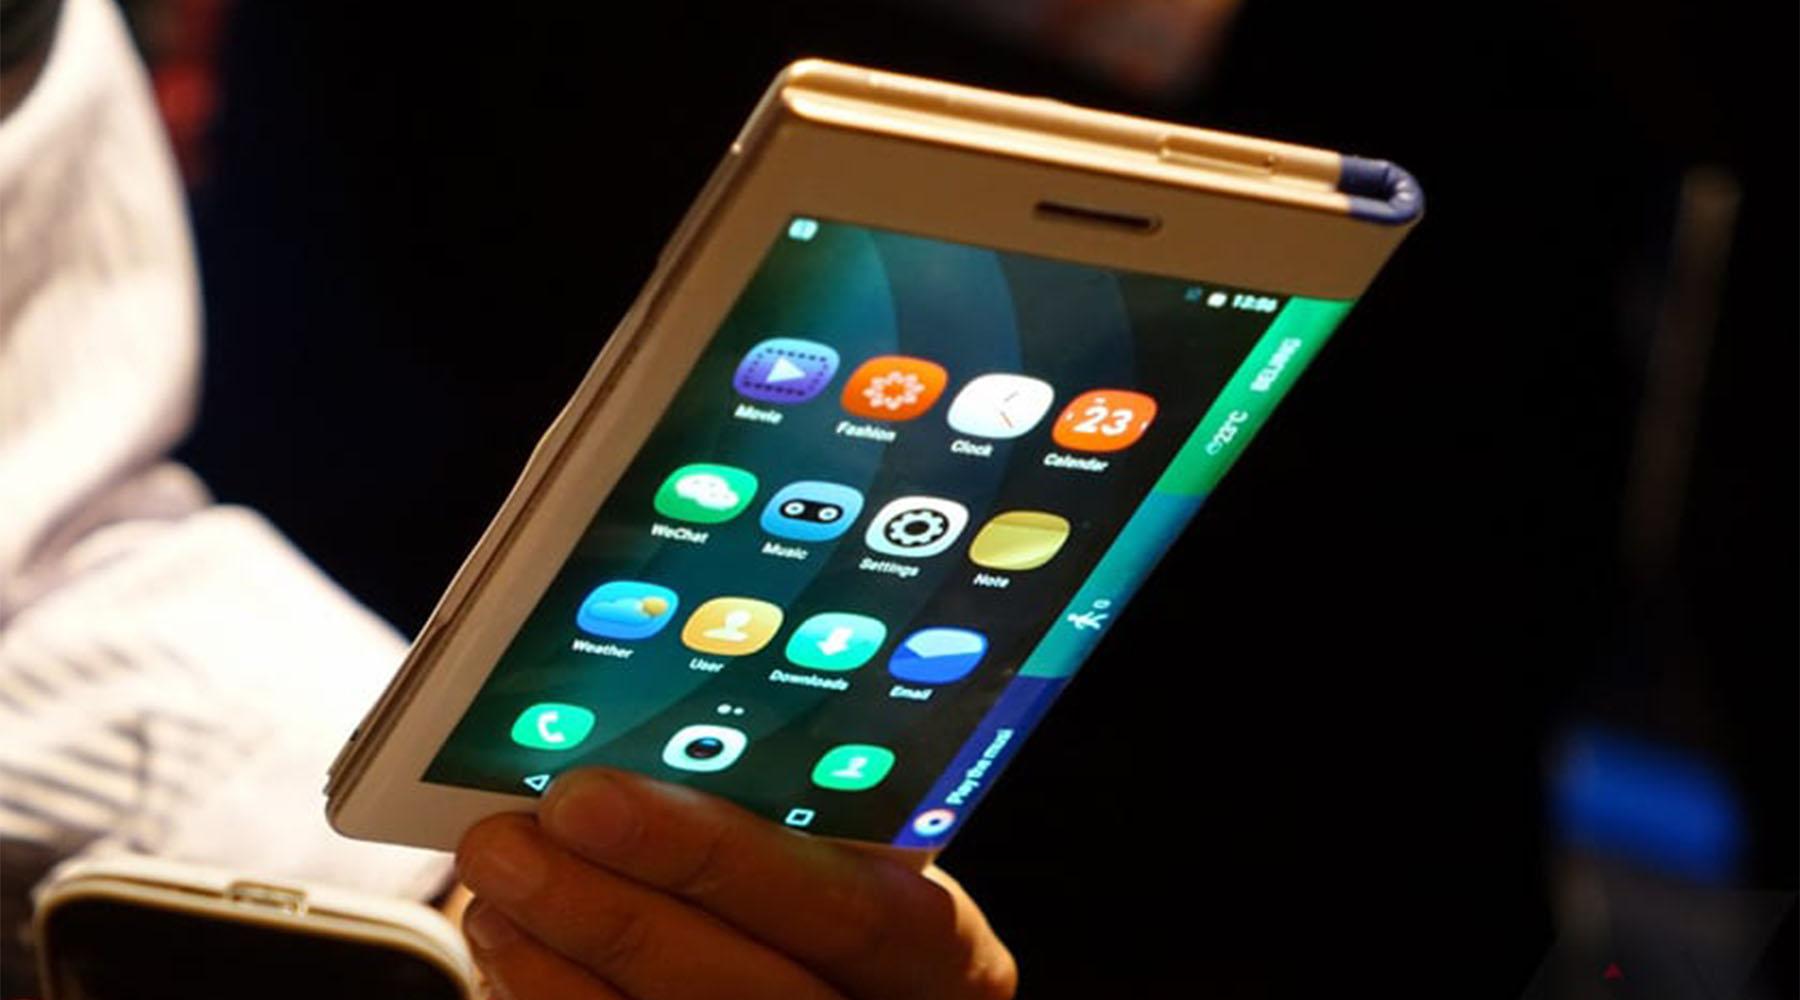 marque LG smartphone pliable